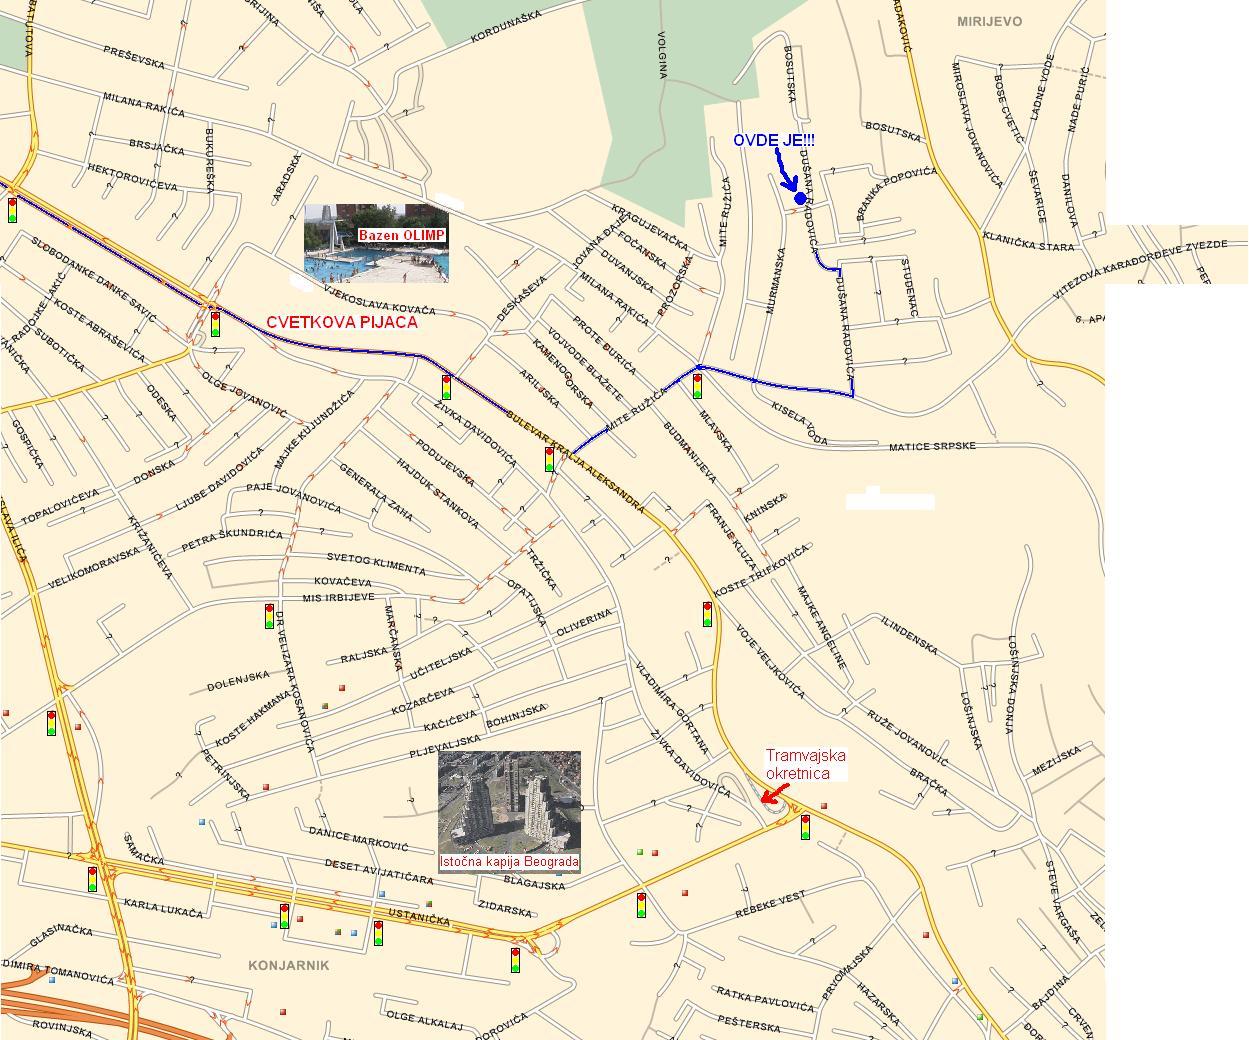 Mapa Mirijeva Beograd Superjoden